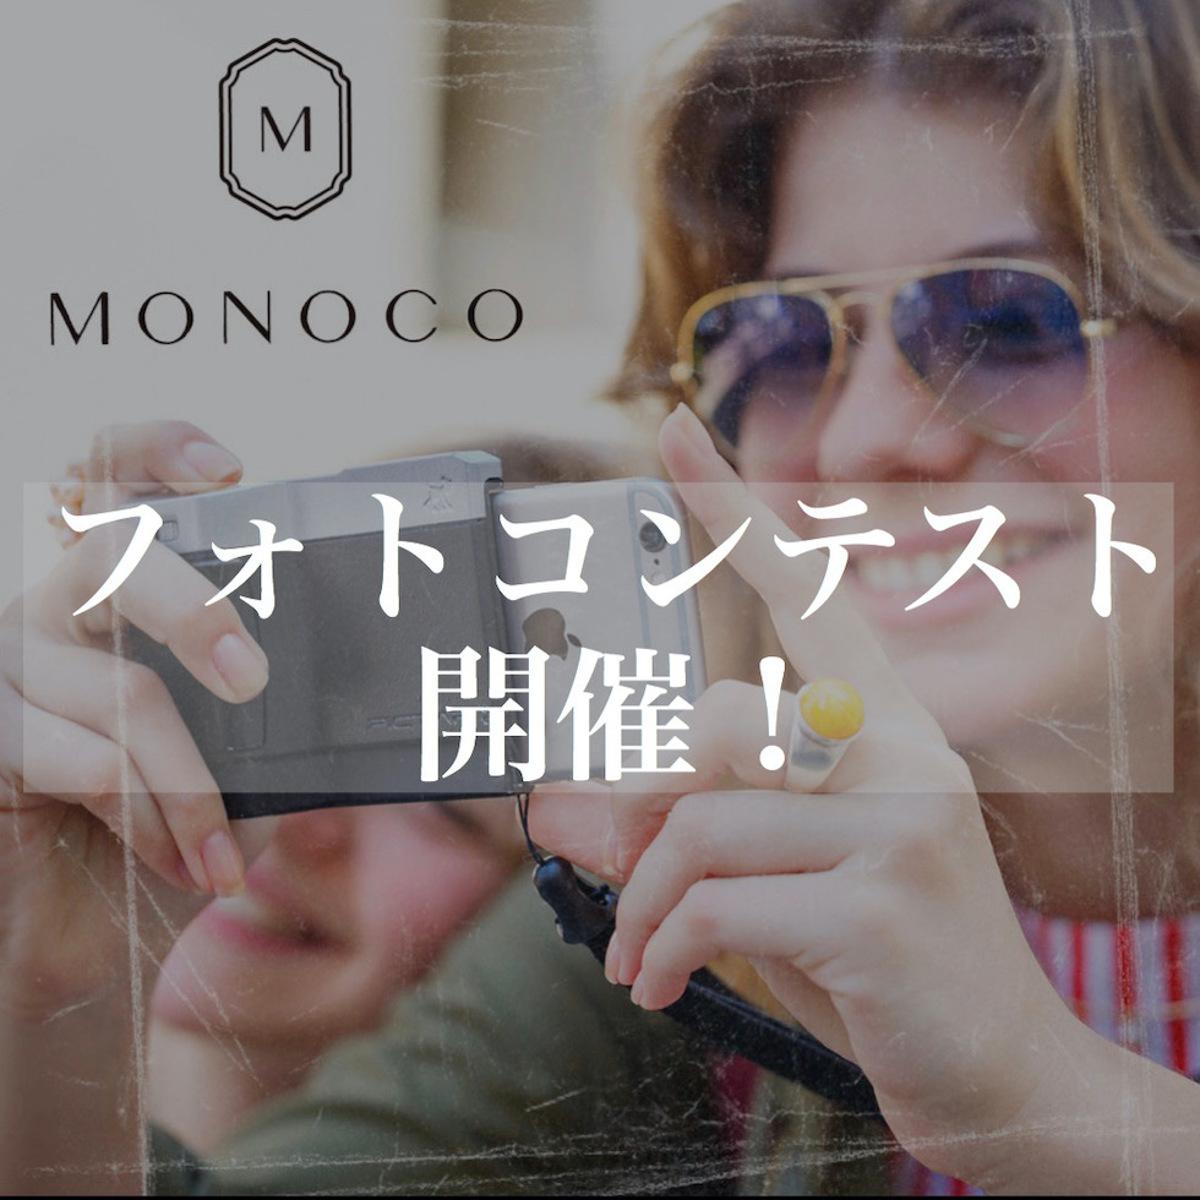 MONOCOフォトコンテスト開催!